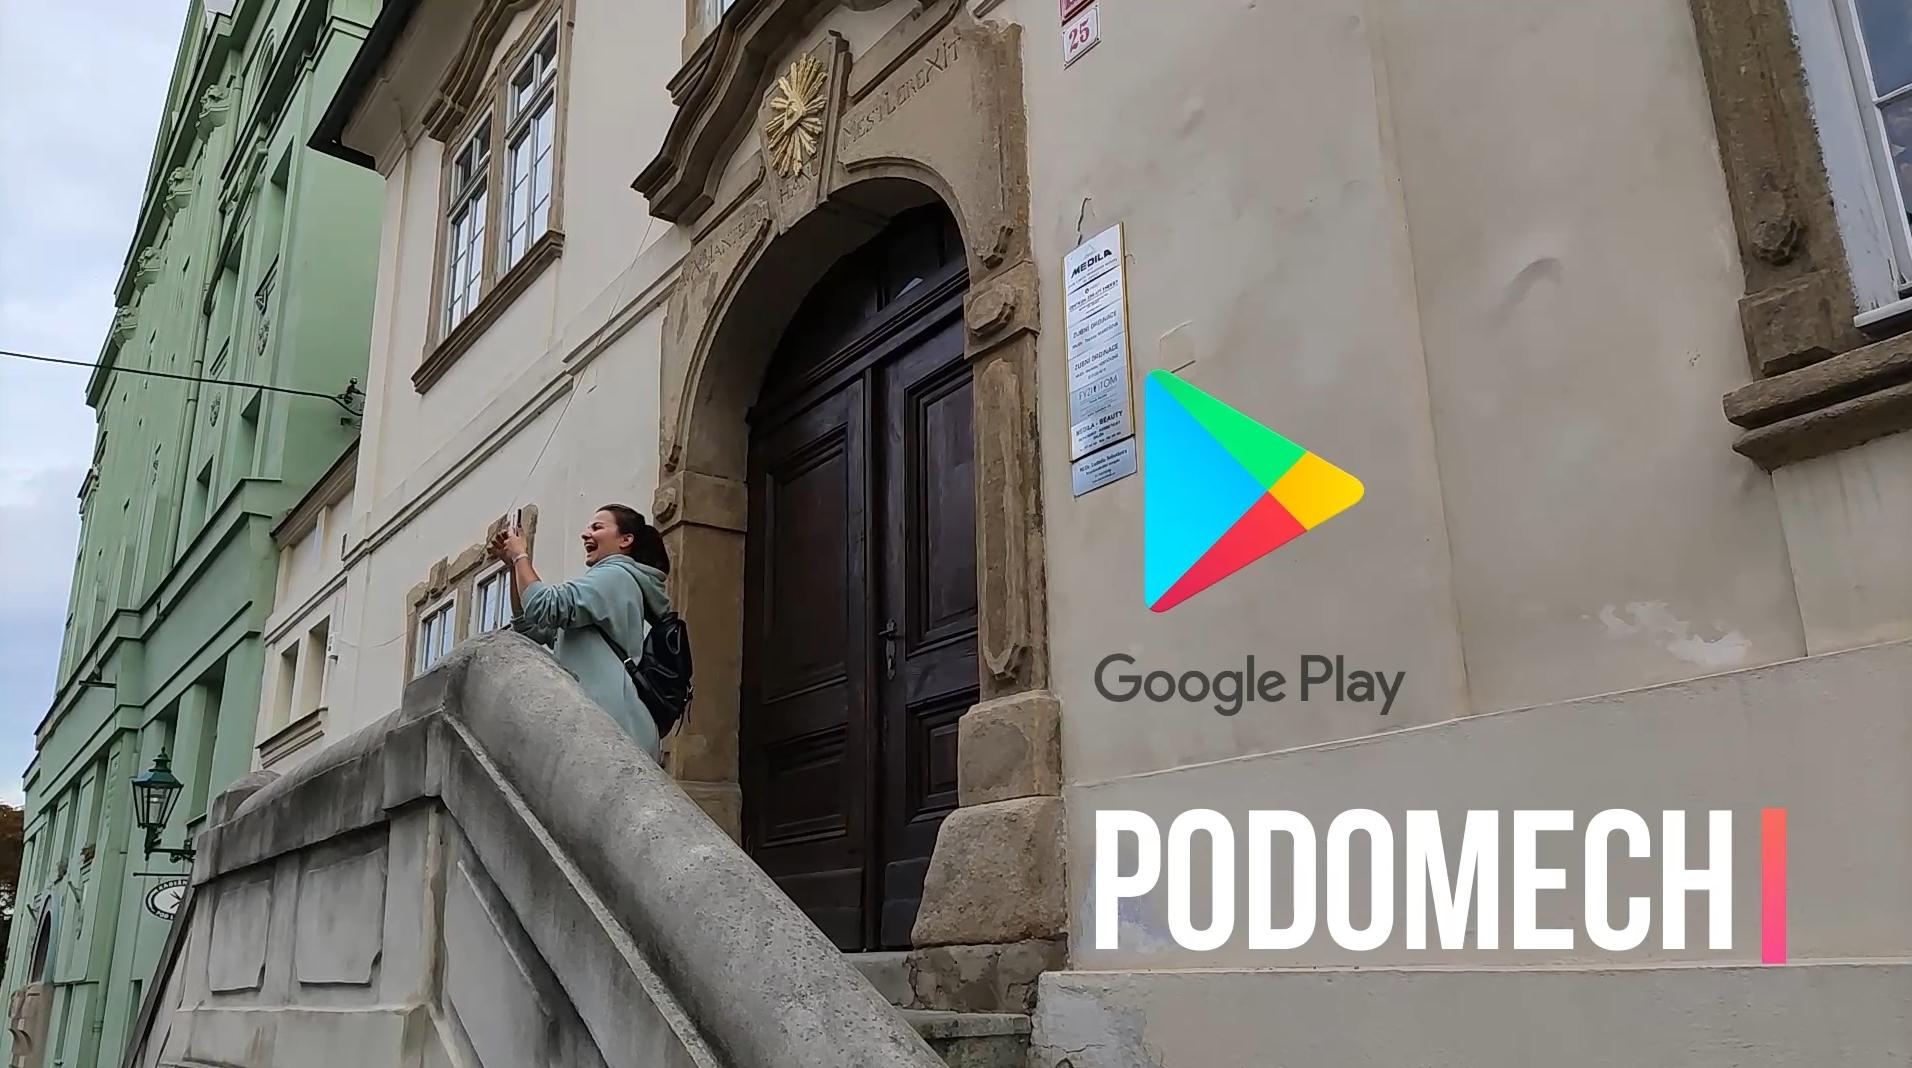 Aplikace Podomech